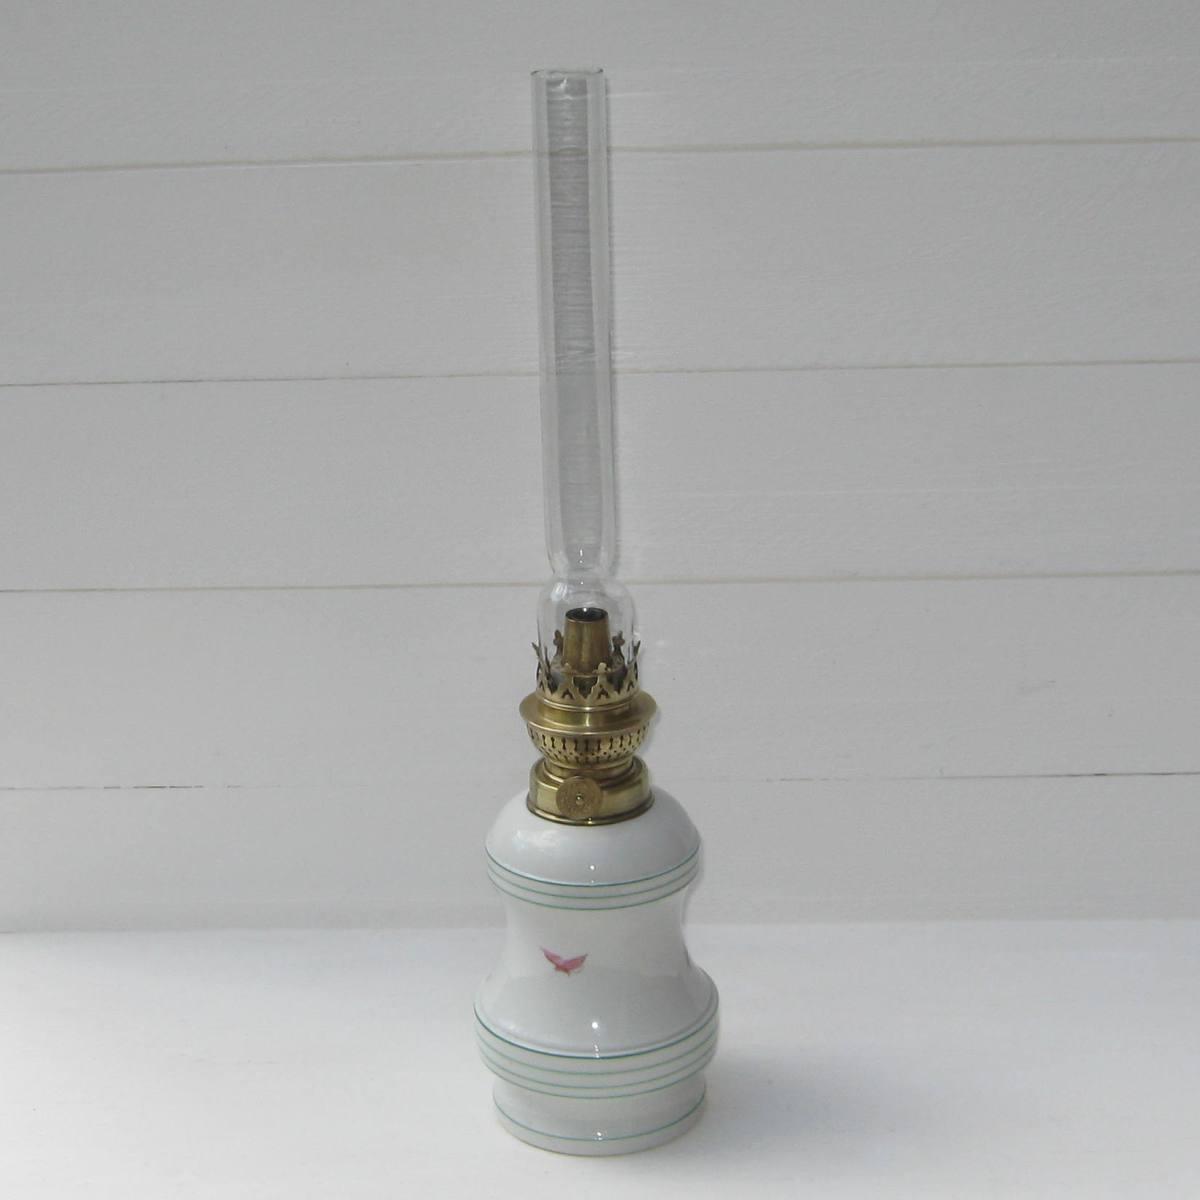 Ancienne lampe a petrole decor eventail 2